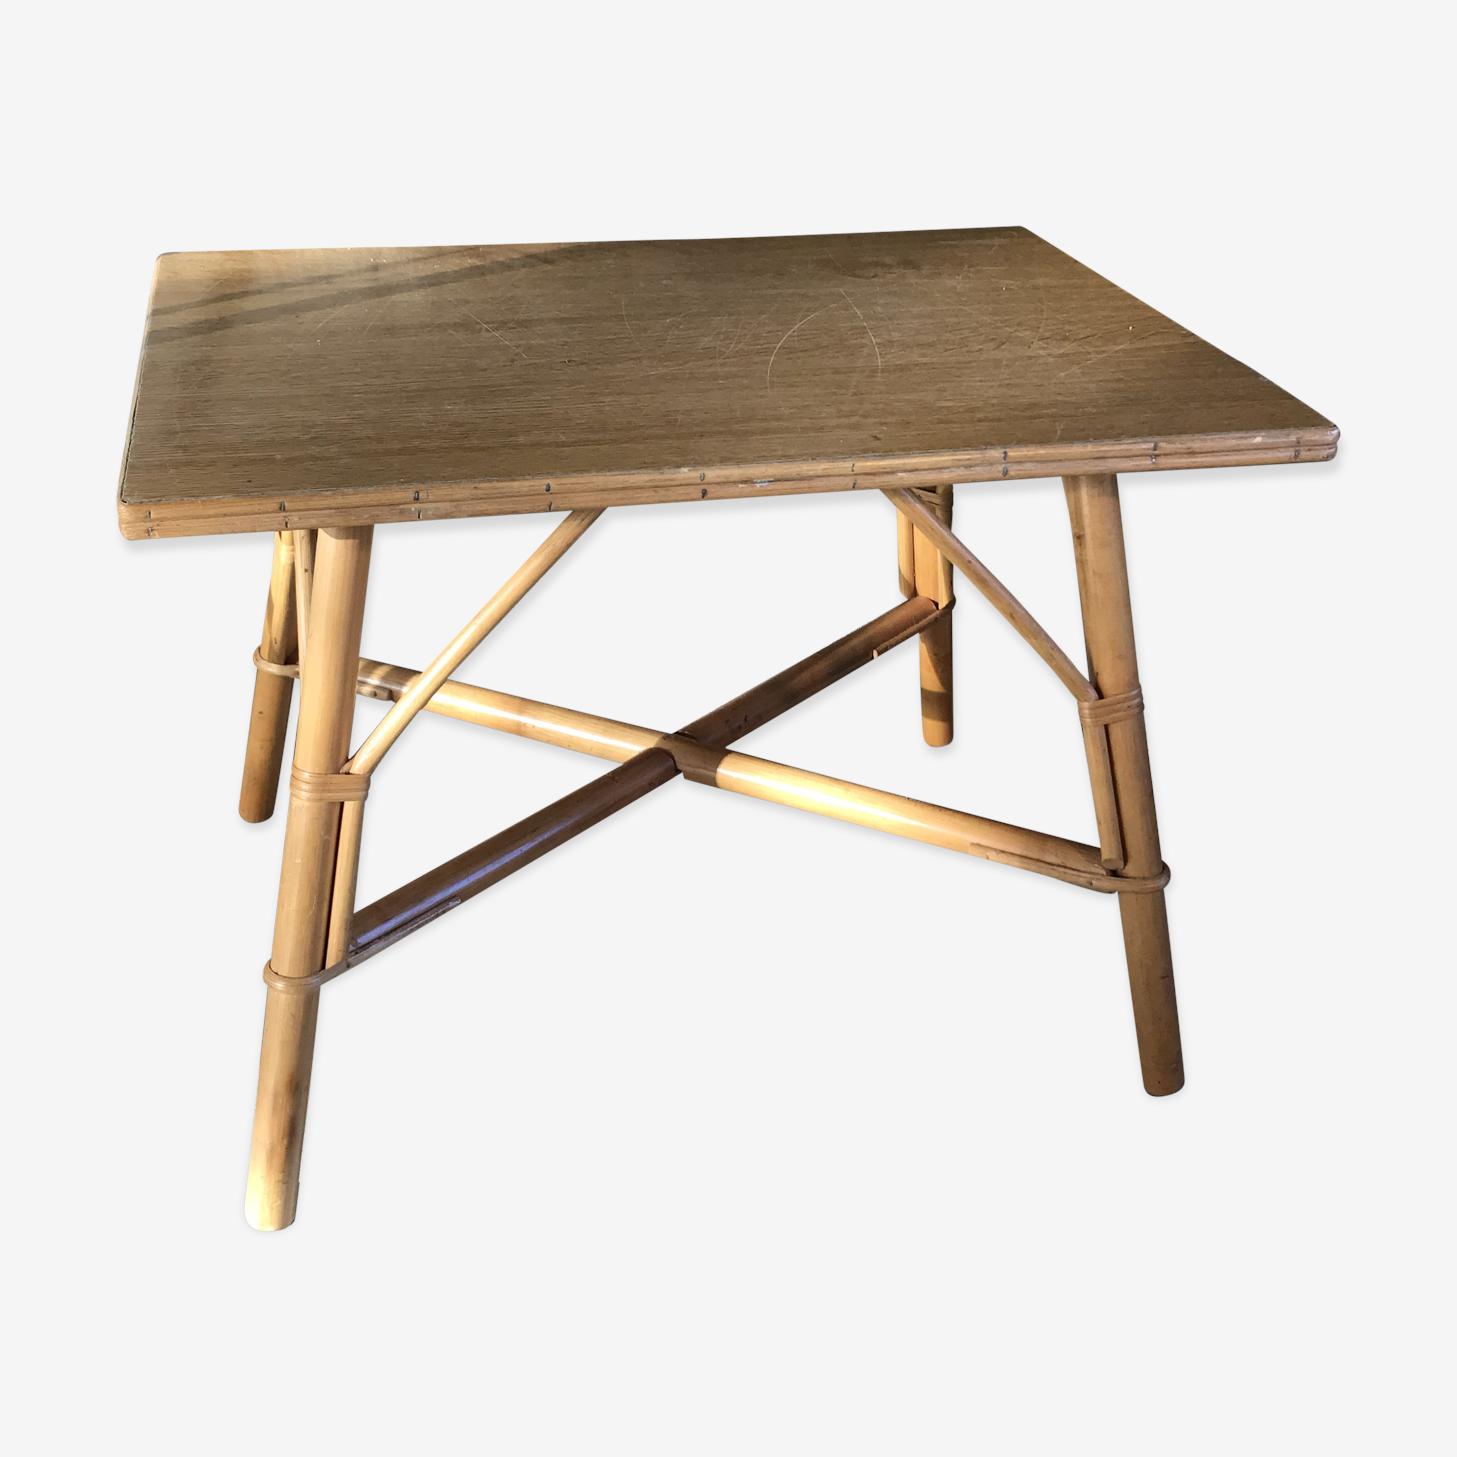 Table basse rectangulaire en rotin vintage